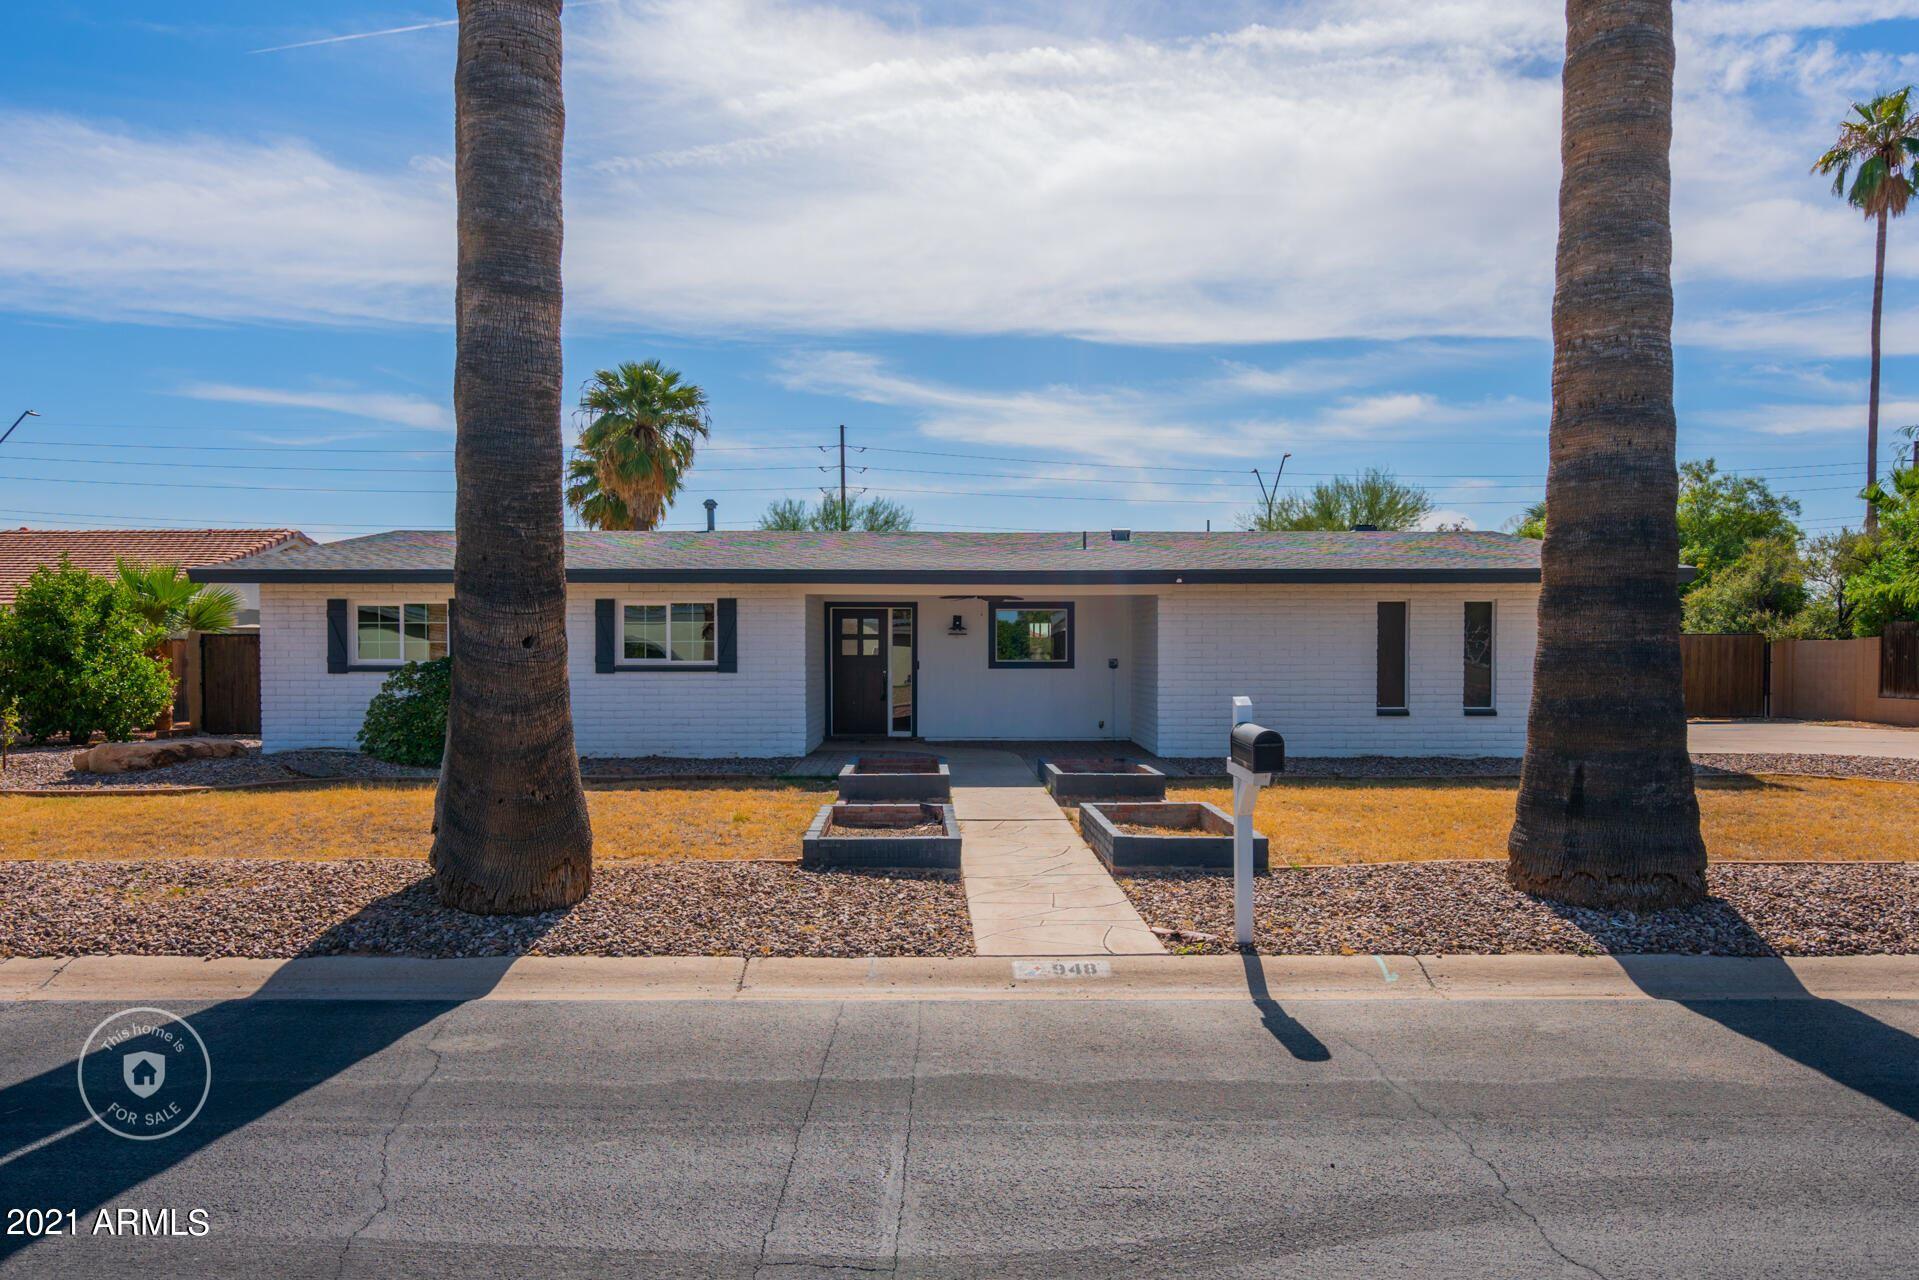 Photo of 948 CASTILLO Drive S, Litchfield Park, AZ 85340 (MLS # 6311391)